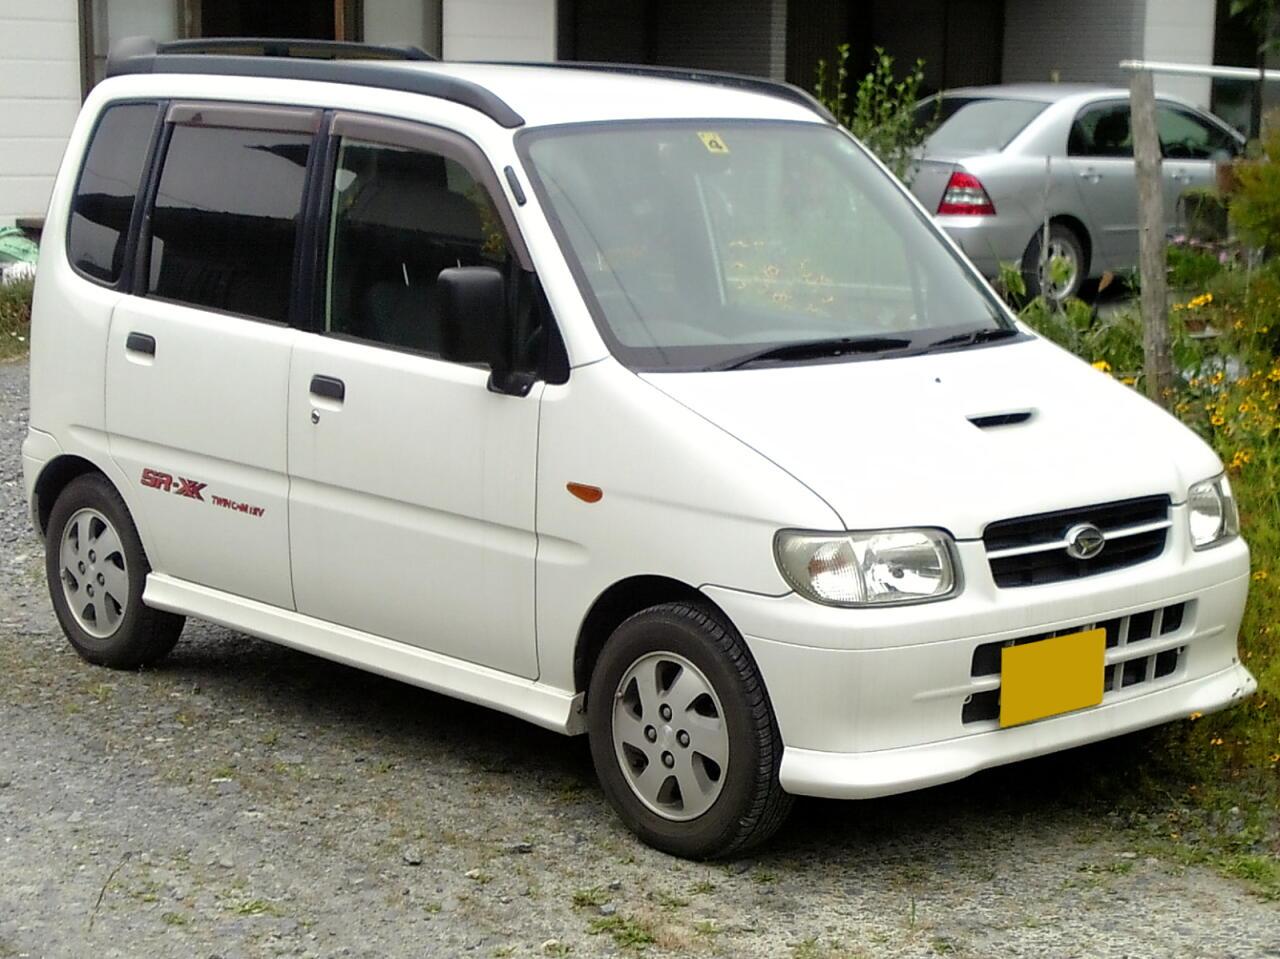 File:Daihatsu Move Sr-xx 1998.jpg - Wikipedia, the free encyclopedia